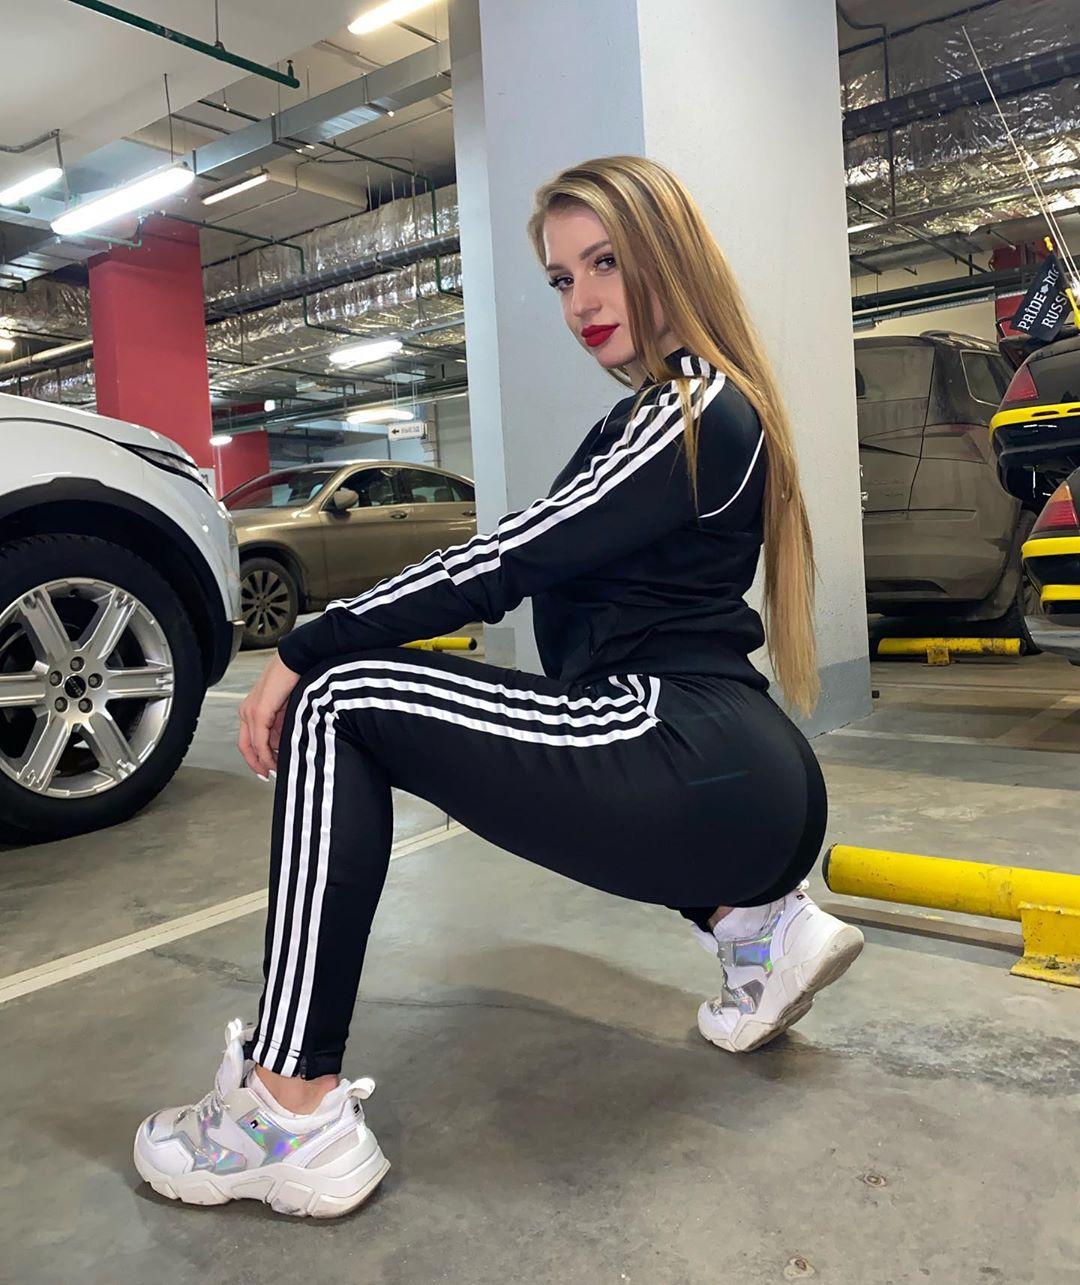 Polina-Dubkova-Wa-a-ers-Insta-Fit-Bio-3